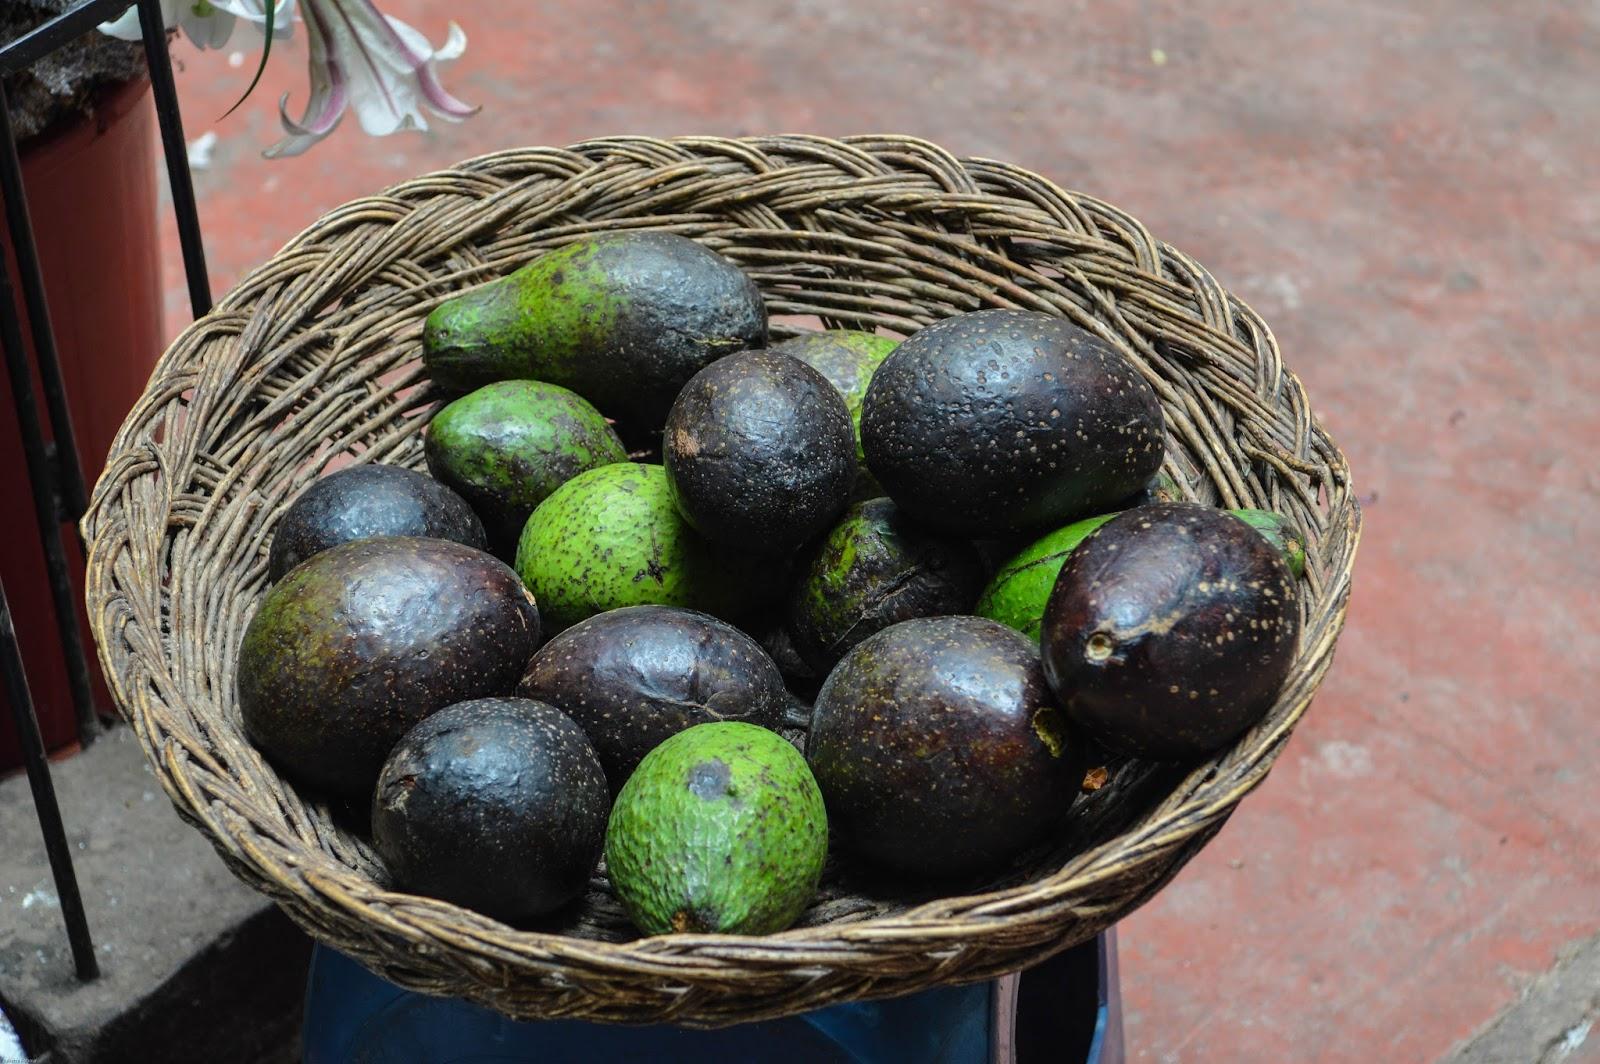 Avocats sur les marchés péruviens, Urubamba